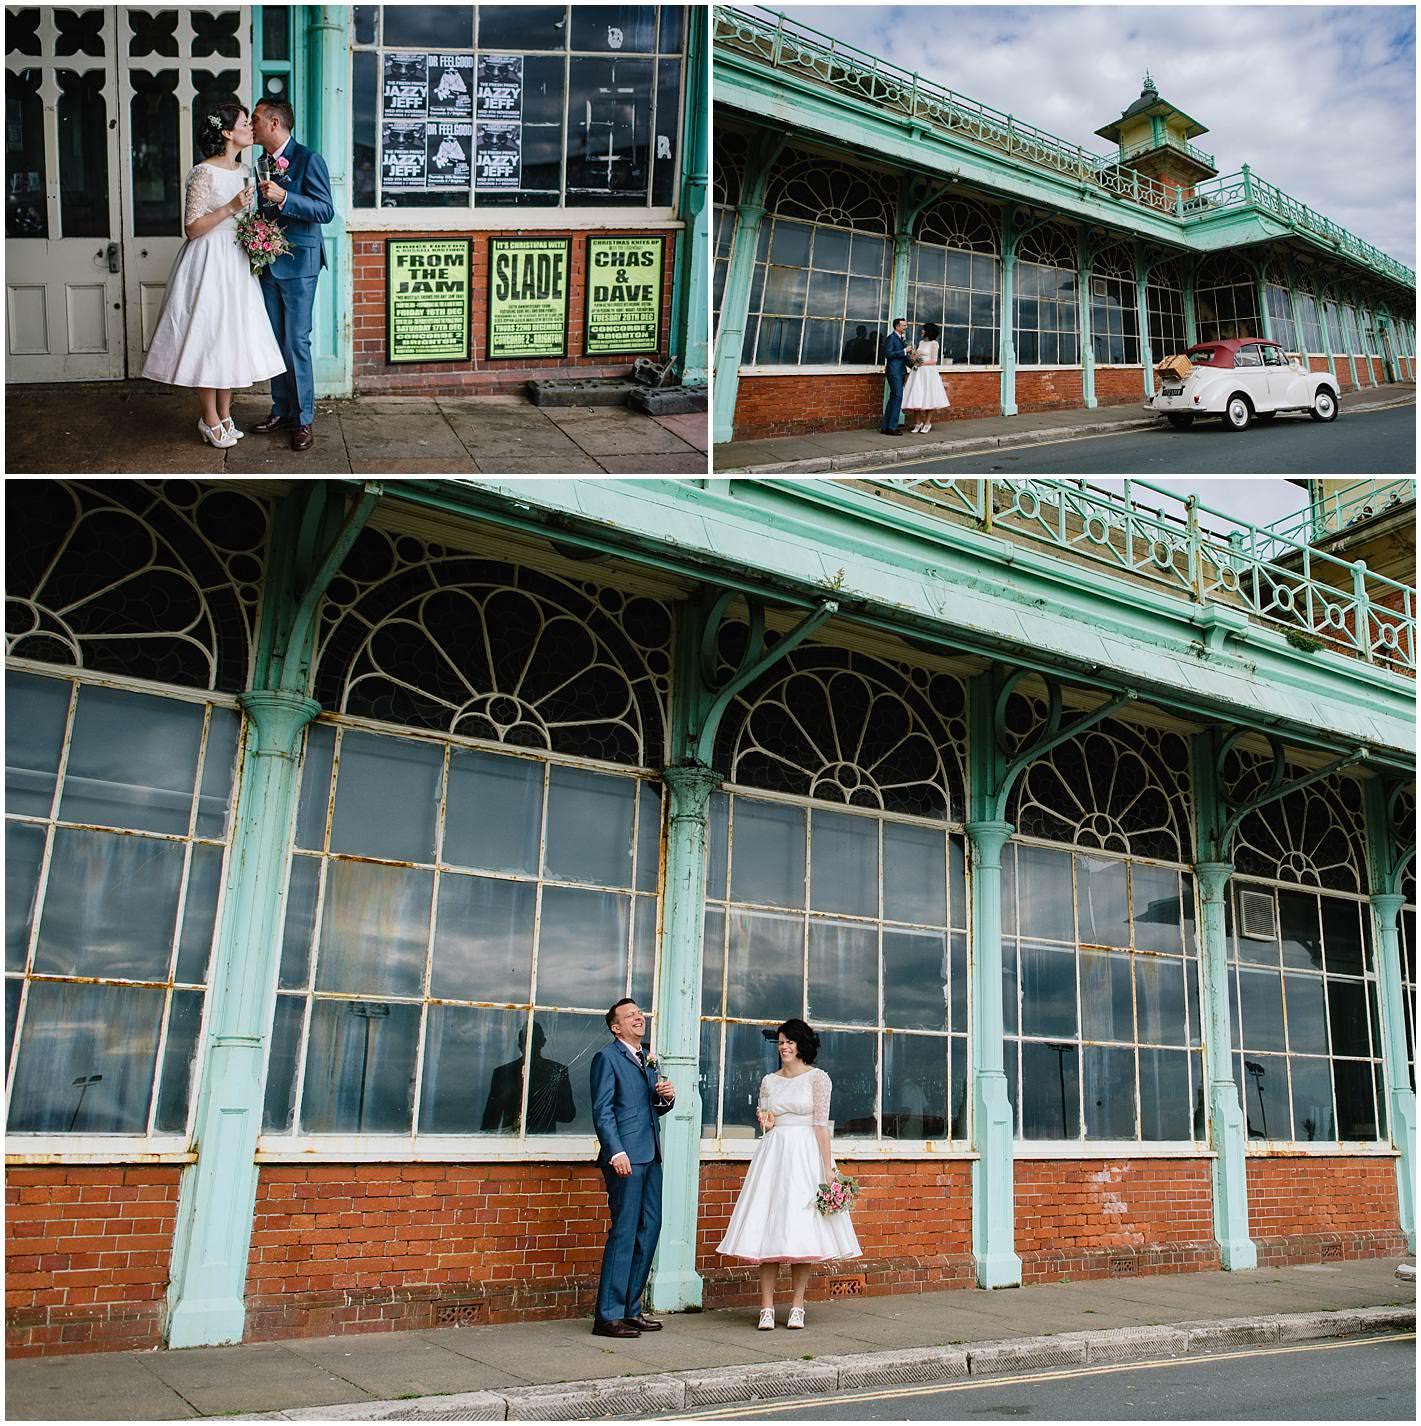 royal-pavilion-wedding-brighton400